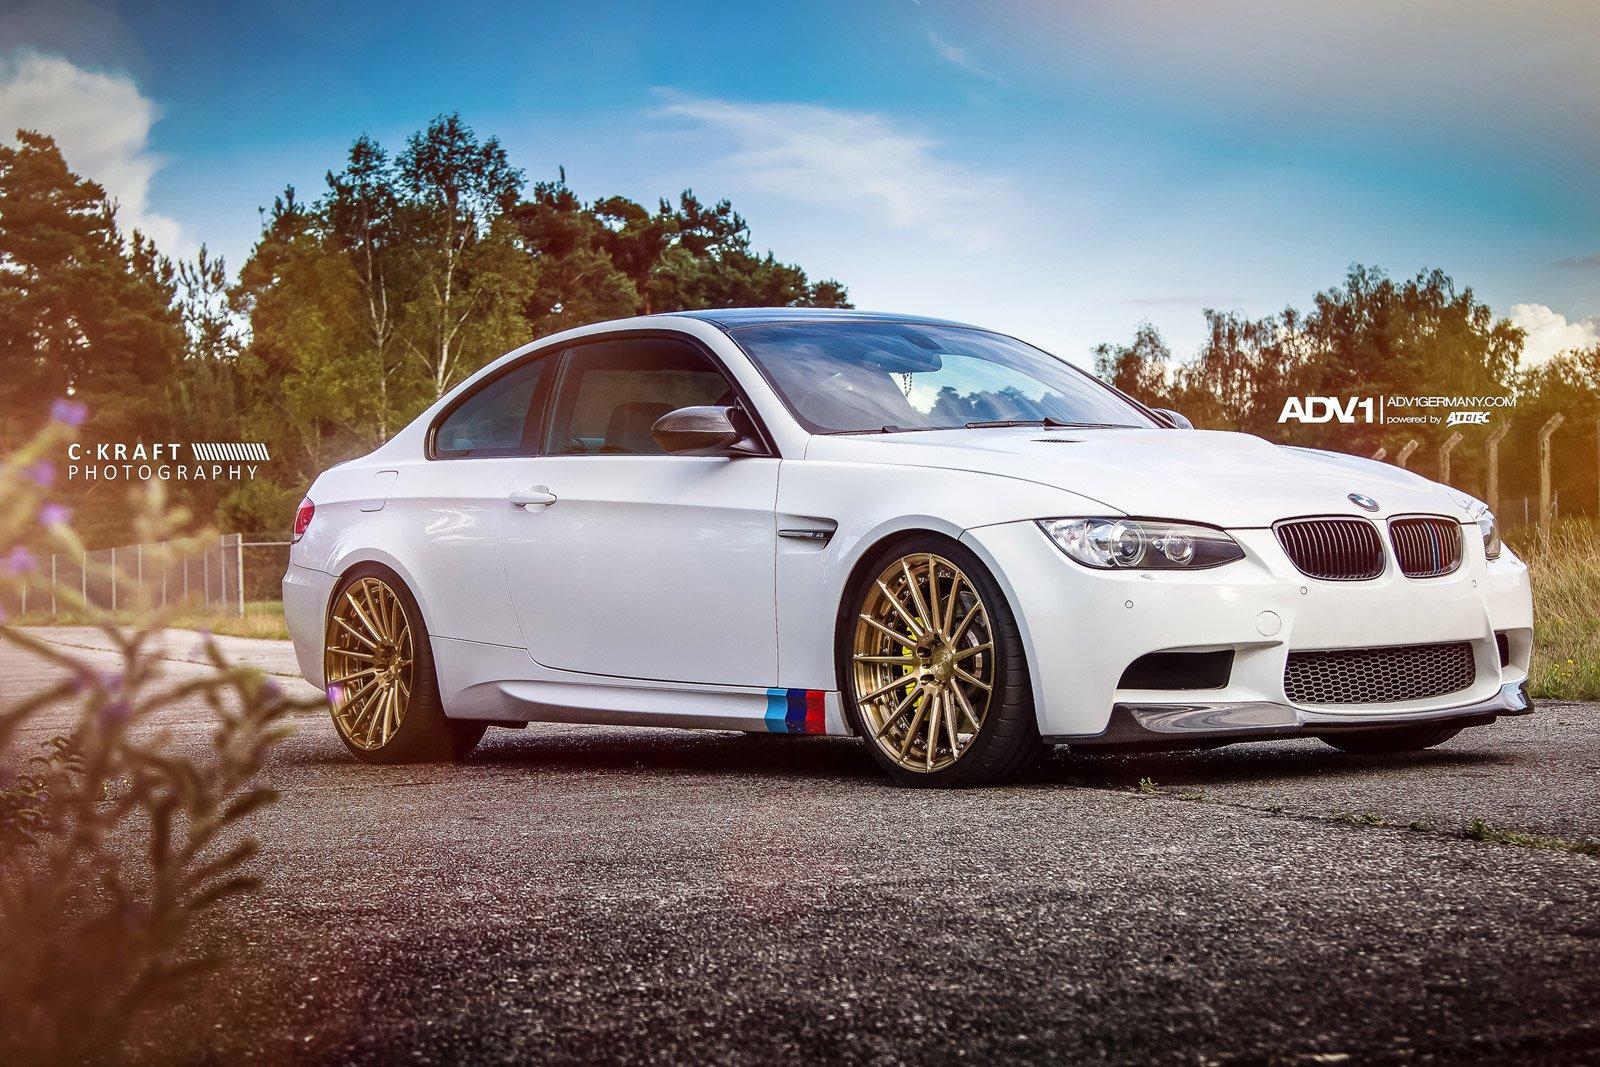 2014_BMW_M3_e92_AMG_adv1_wheels_tuning_1600x1067.jpg